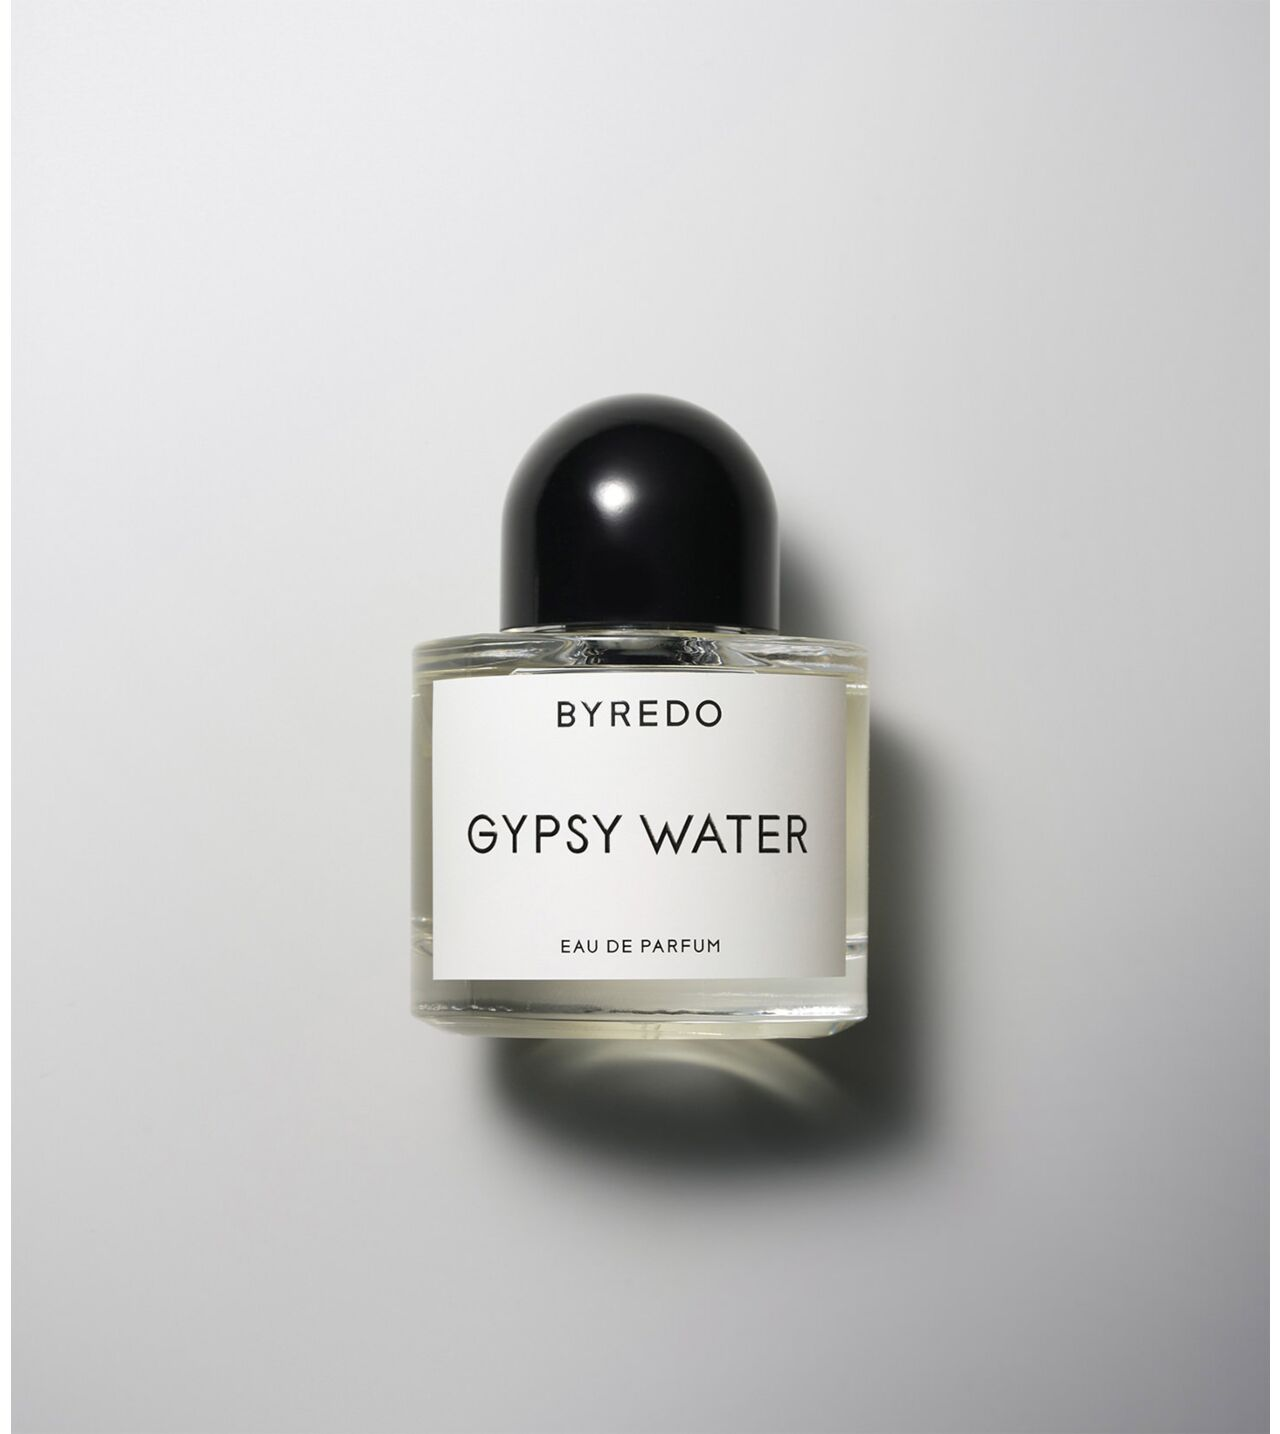 Picture of Byredo Gypsy Water Eau de Parfum